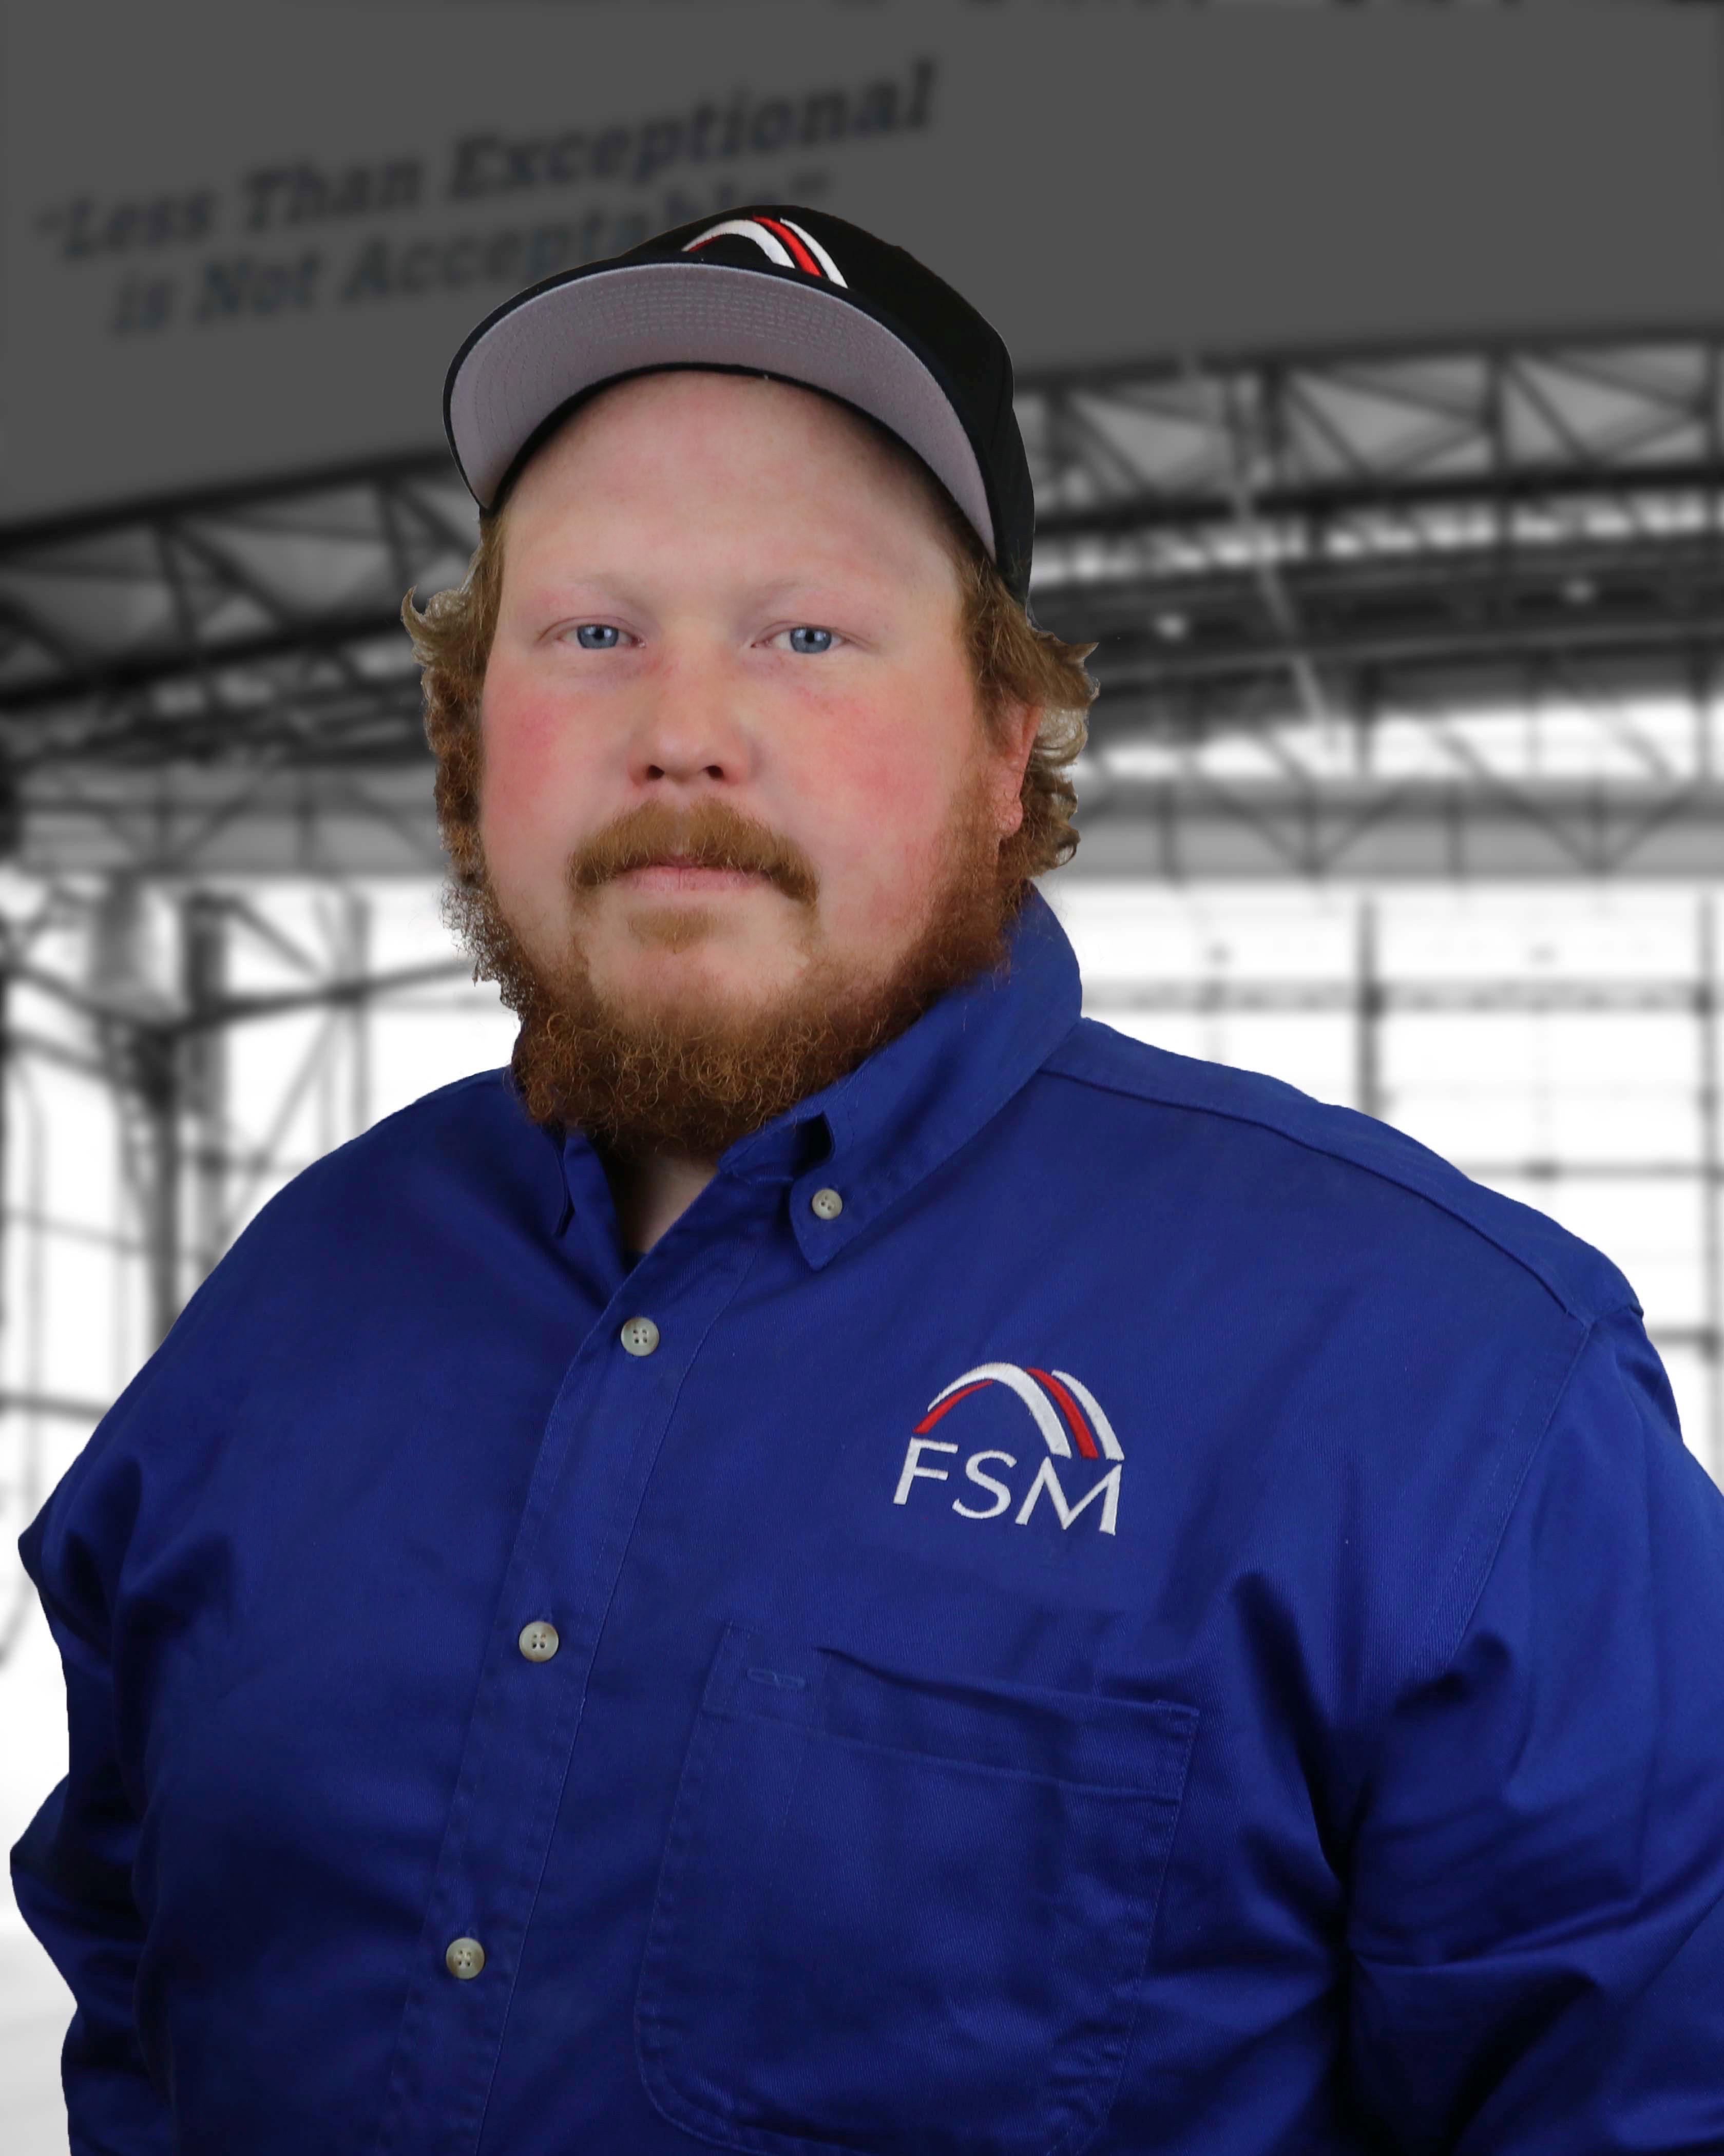 FSM Tyler Carver Foreman